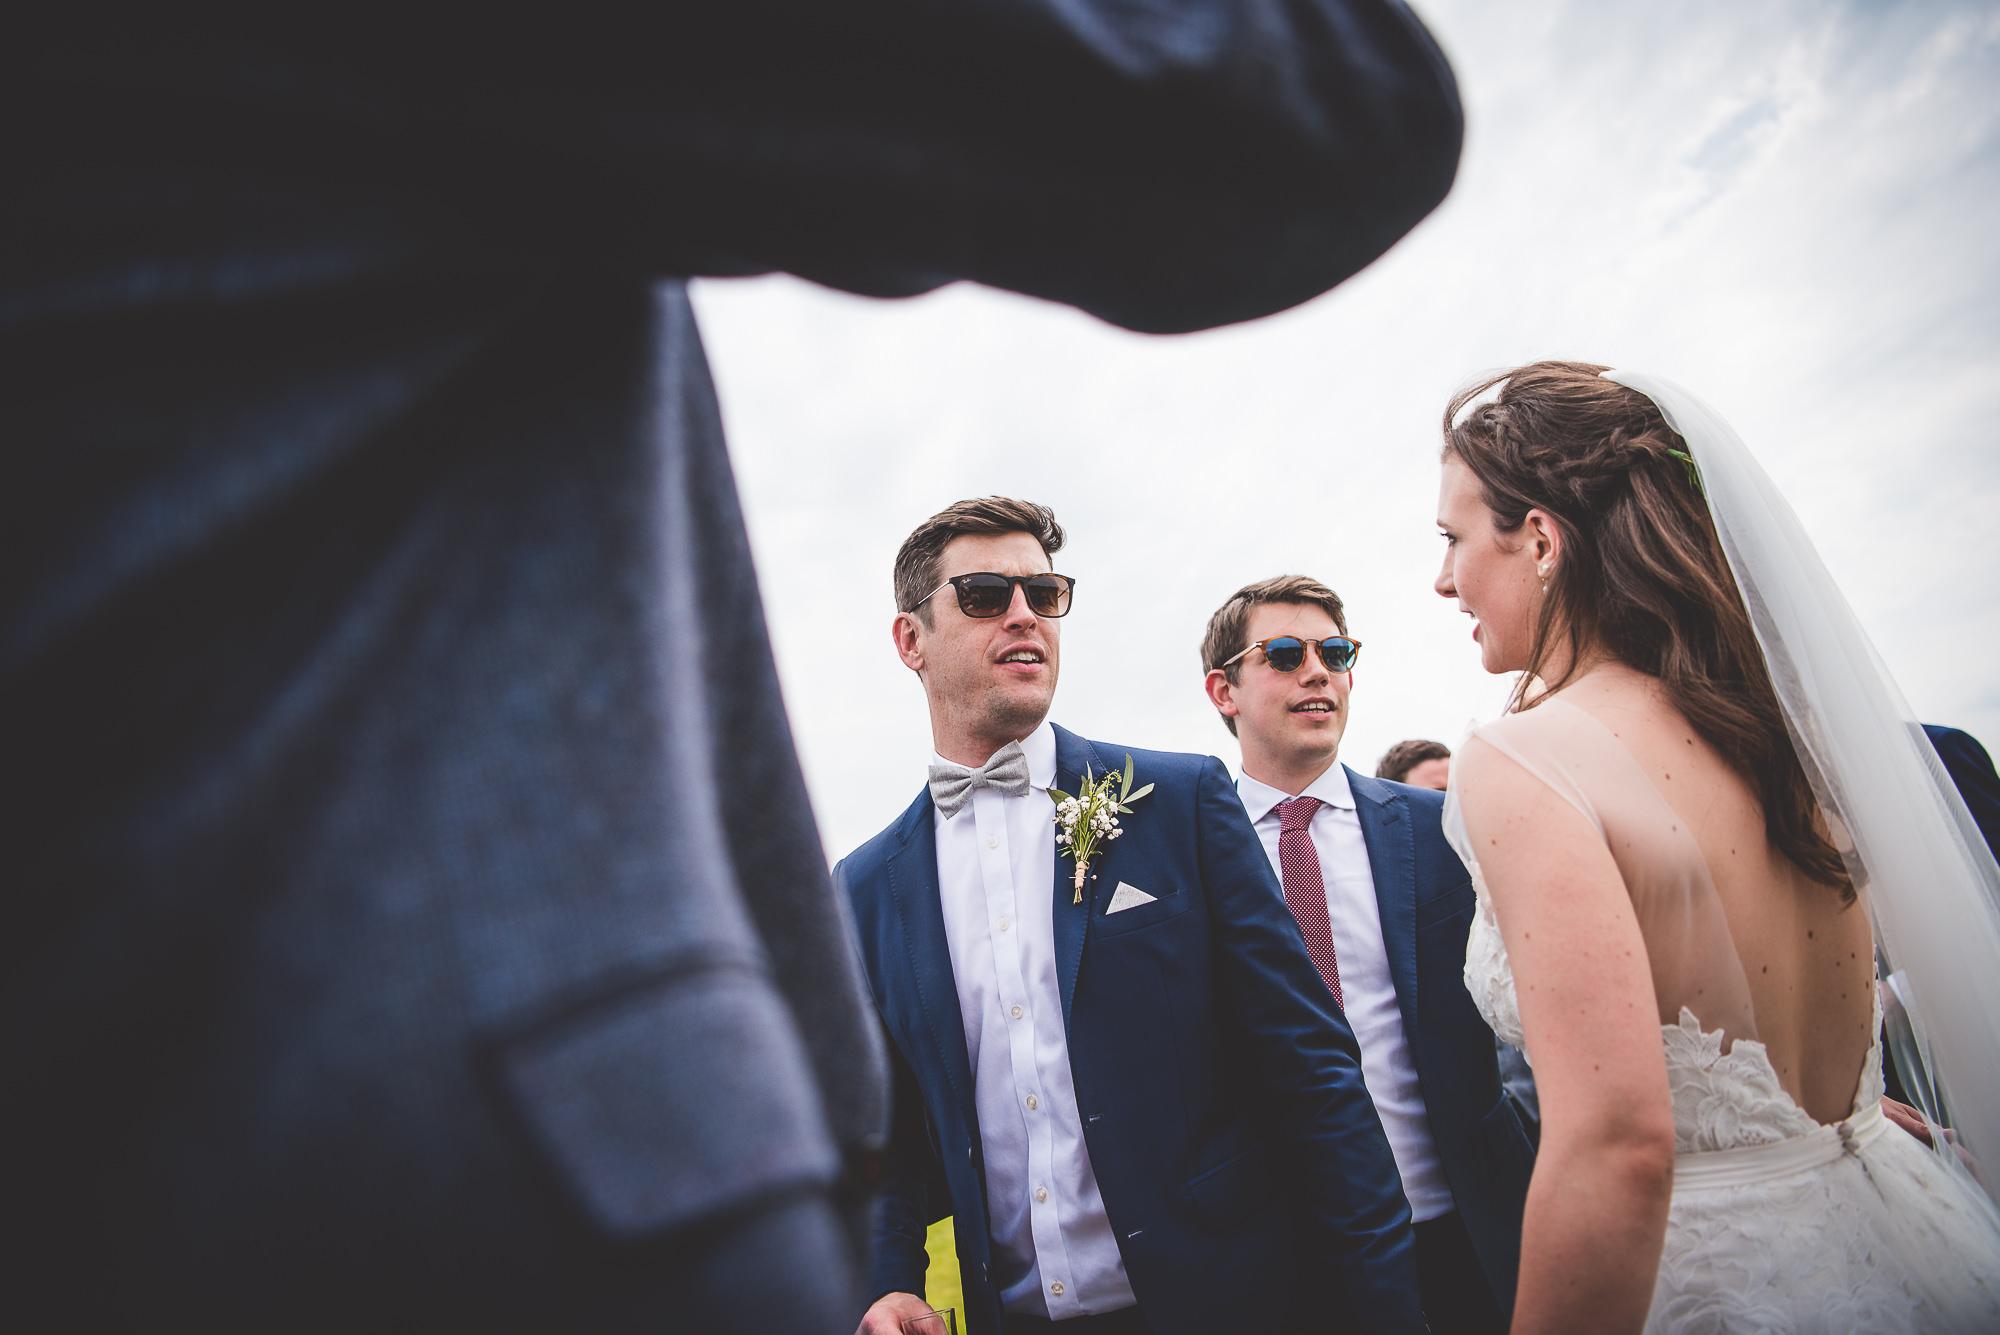 Veils & Bales Wedding Photography | Charlie & Steve SCSS 103